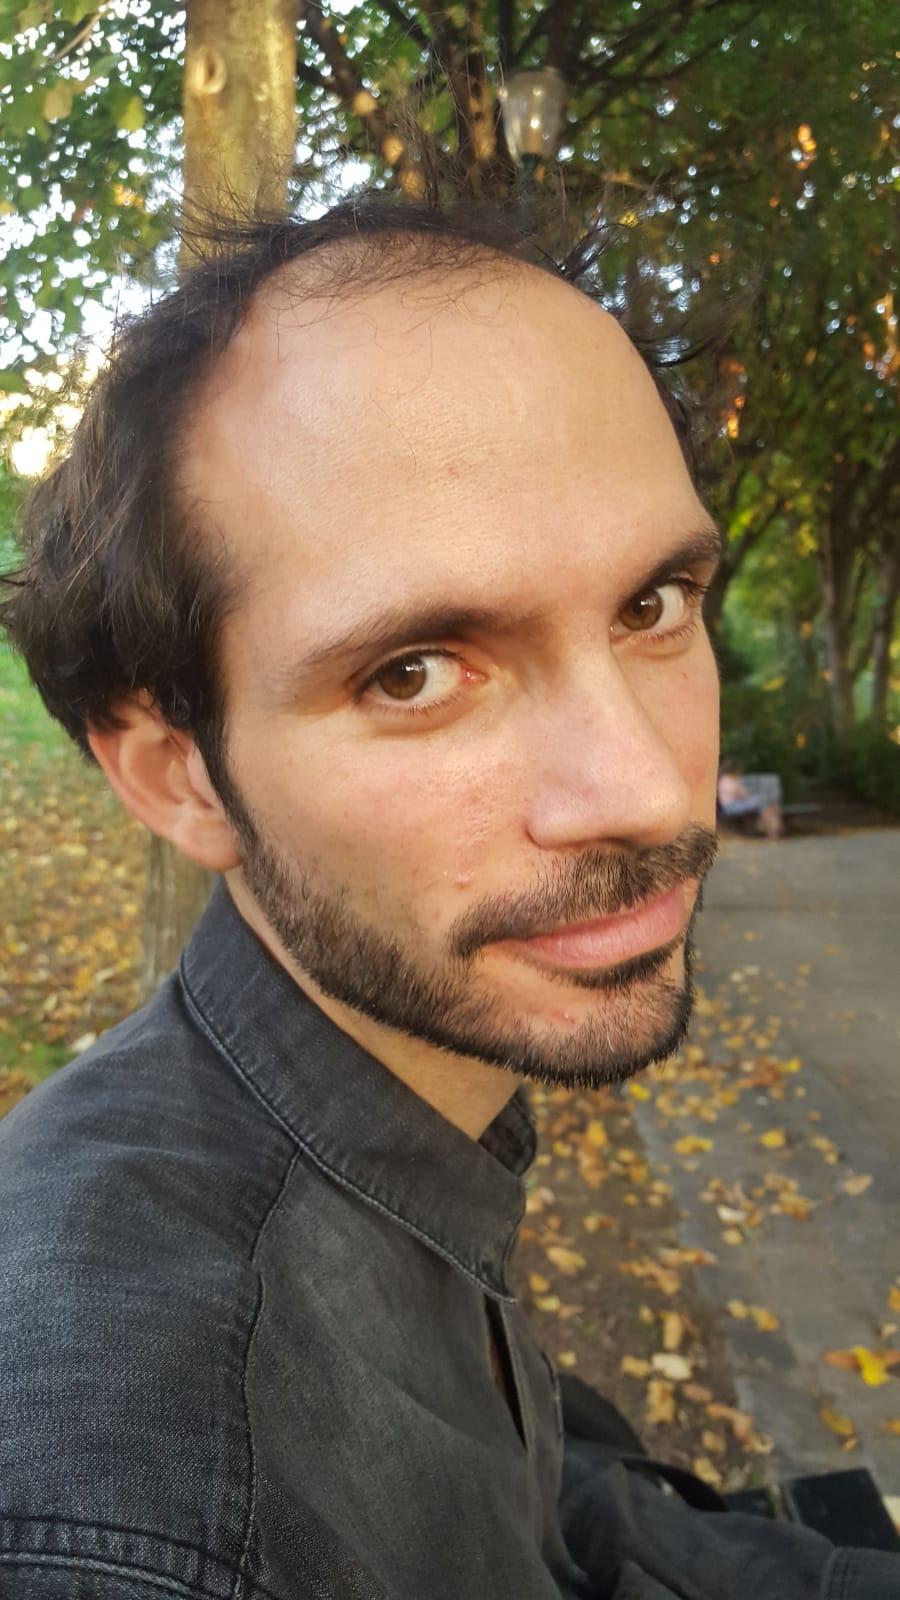 Benoit Delbove